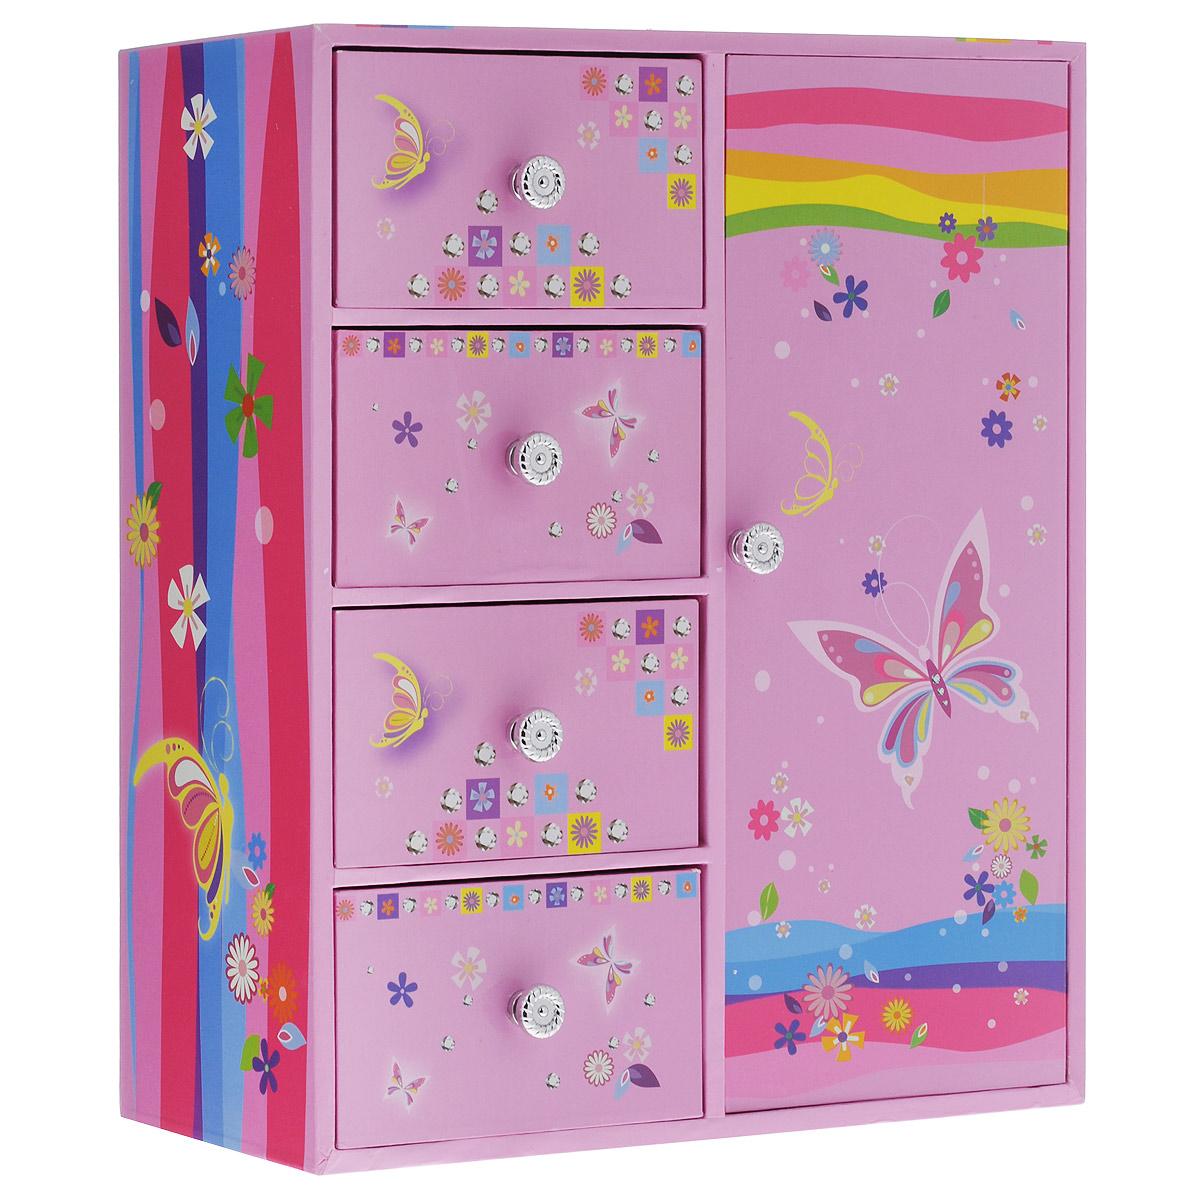 Шкатулка Jakos Бабочки, цвет: розовый